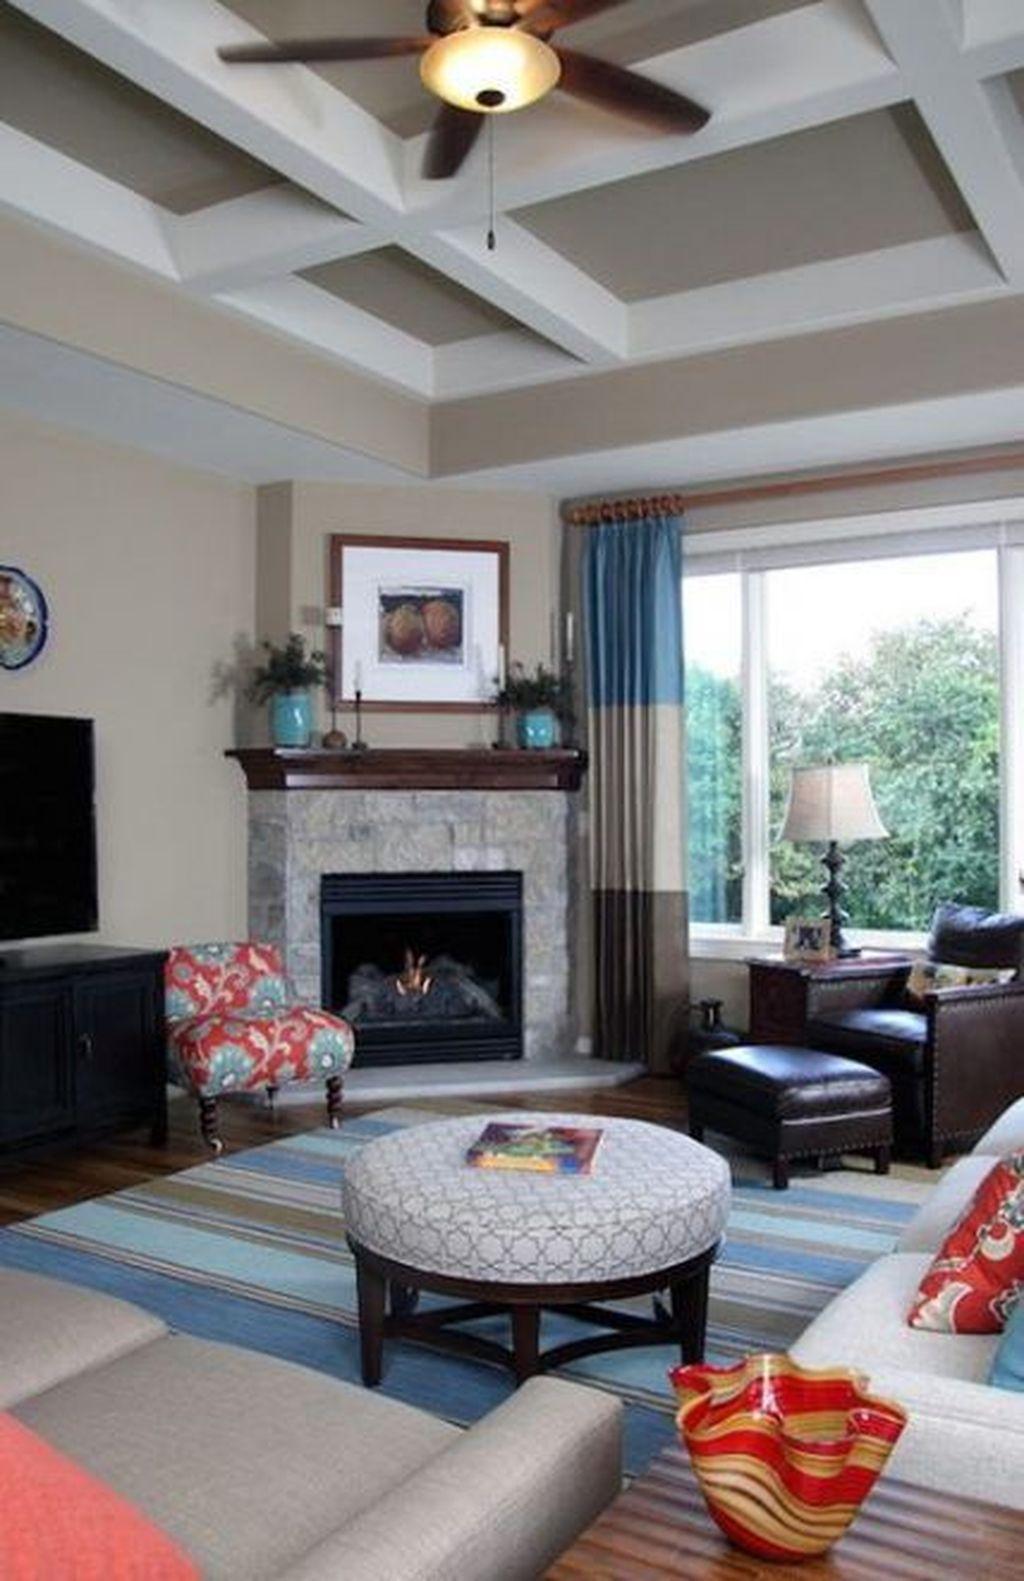 Stunning Corner Fireplace Design For Living Room 15